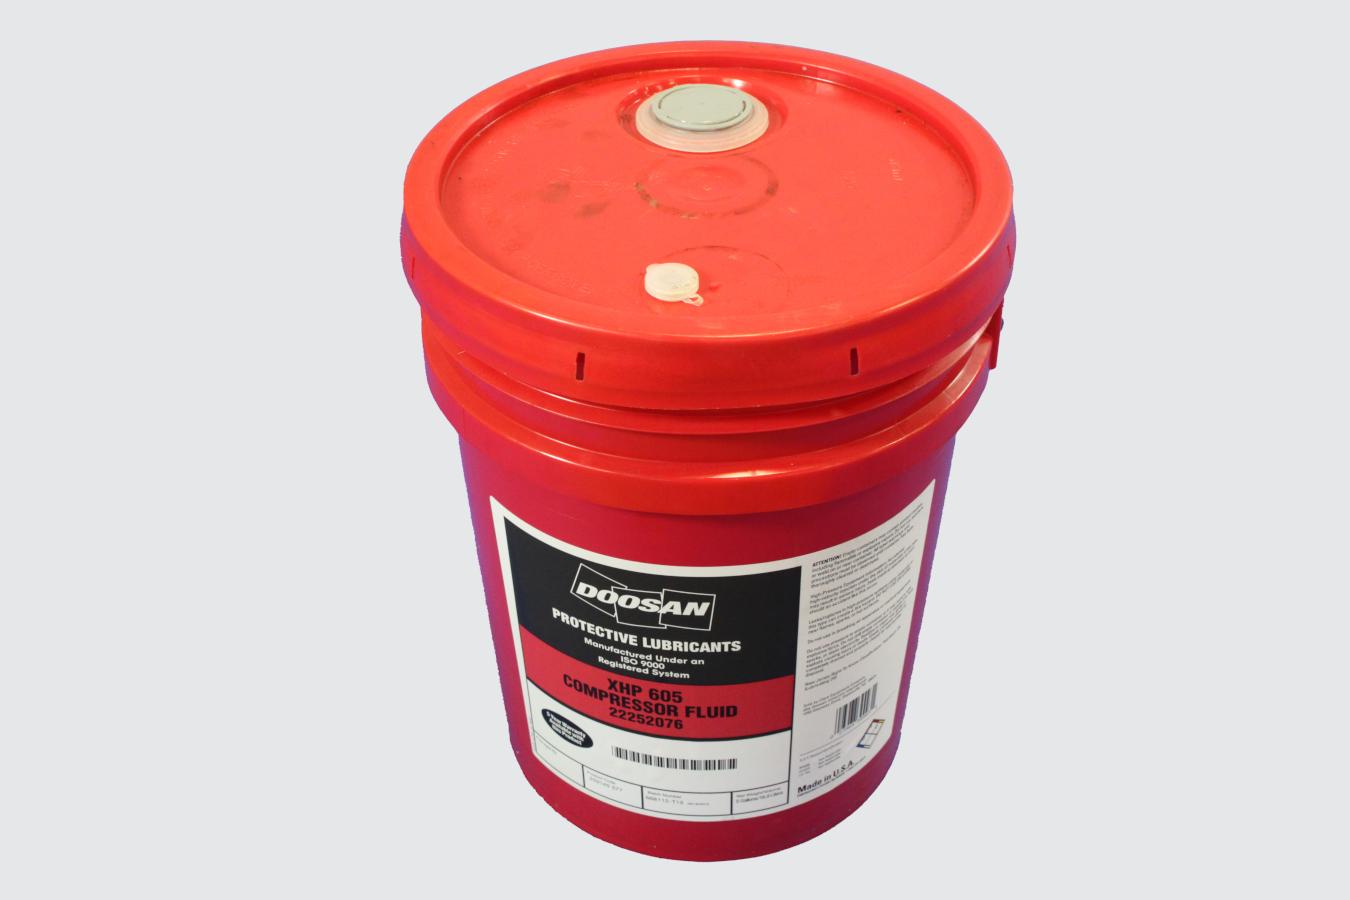 22252076-COMPRESSOR FLUID, XHP605 5 GAL BUCKET